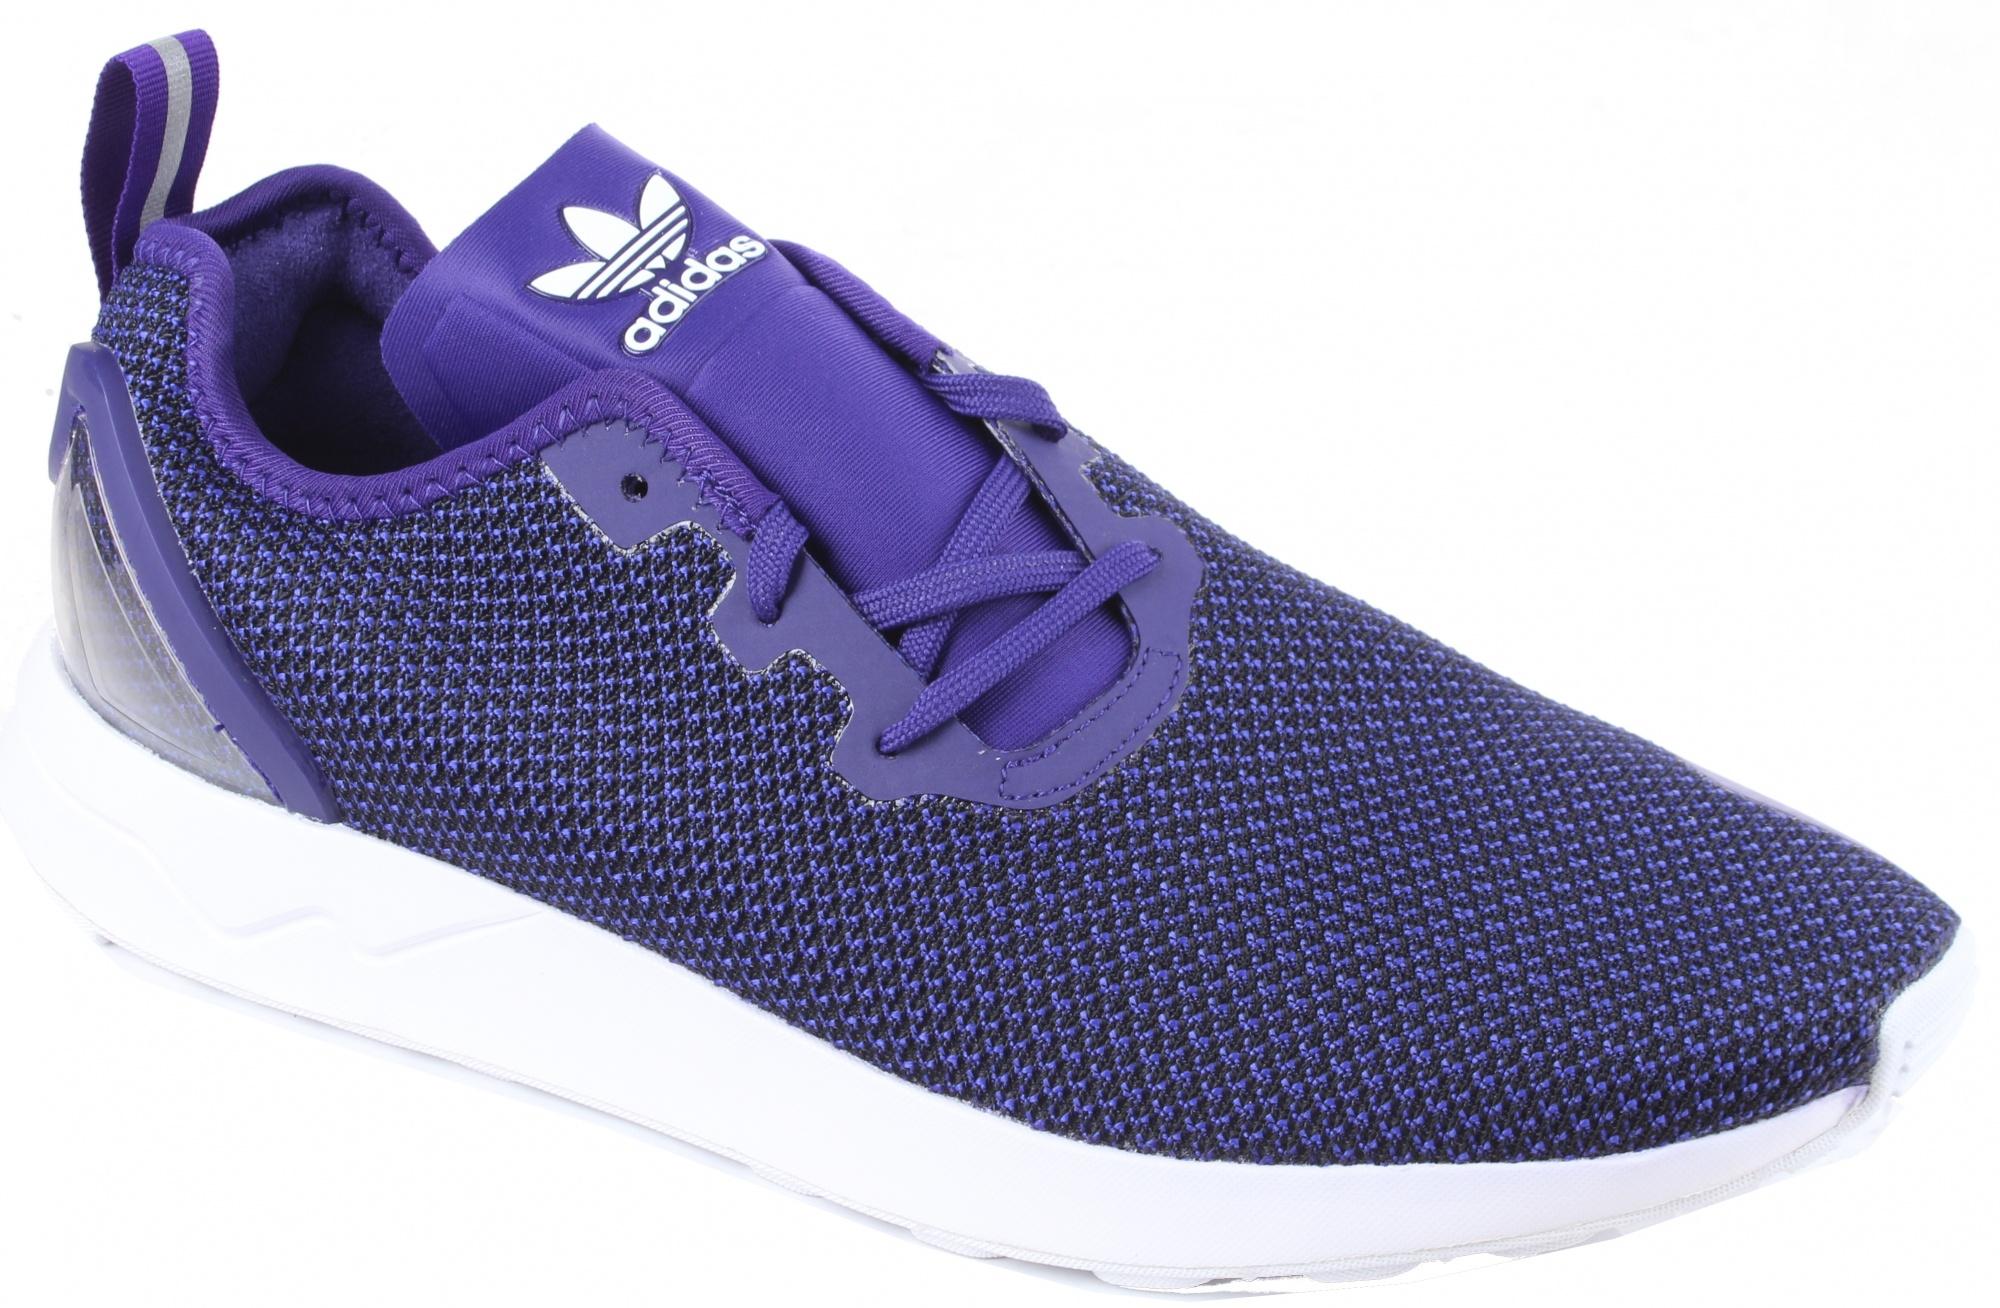 new concept a7041 6d185 adidas sneakers ZX Flux ADV Asym men purple - Internet ...